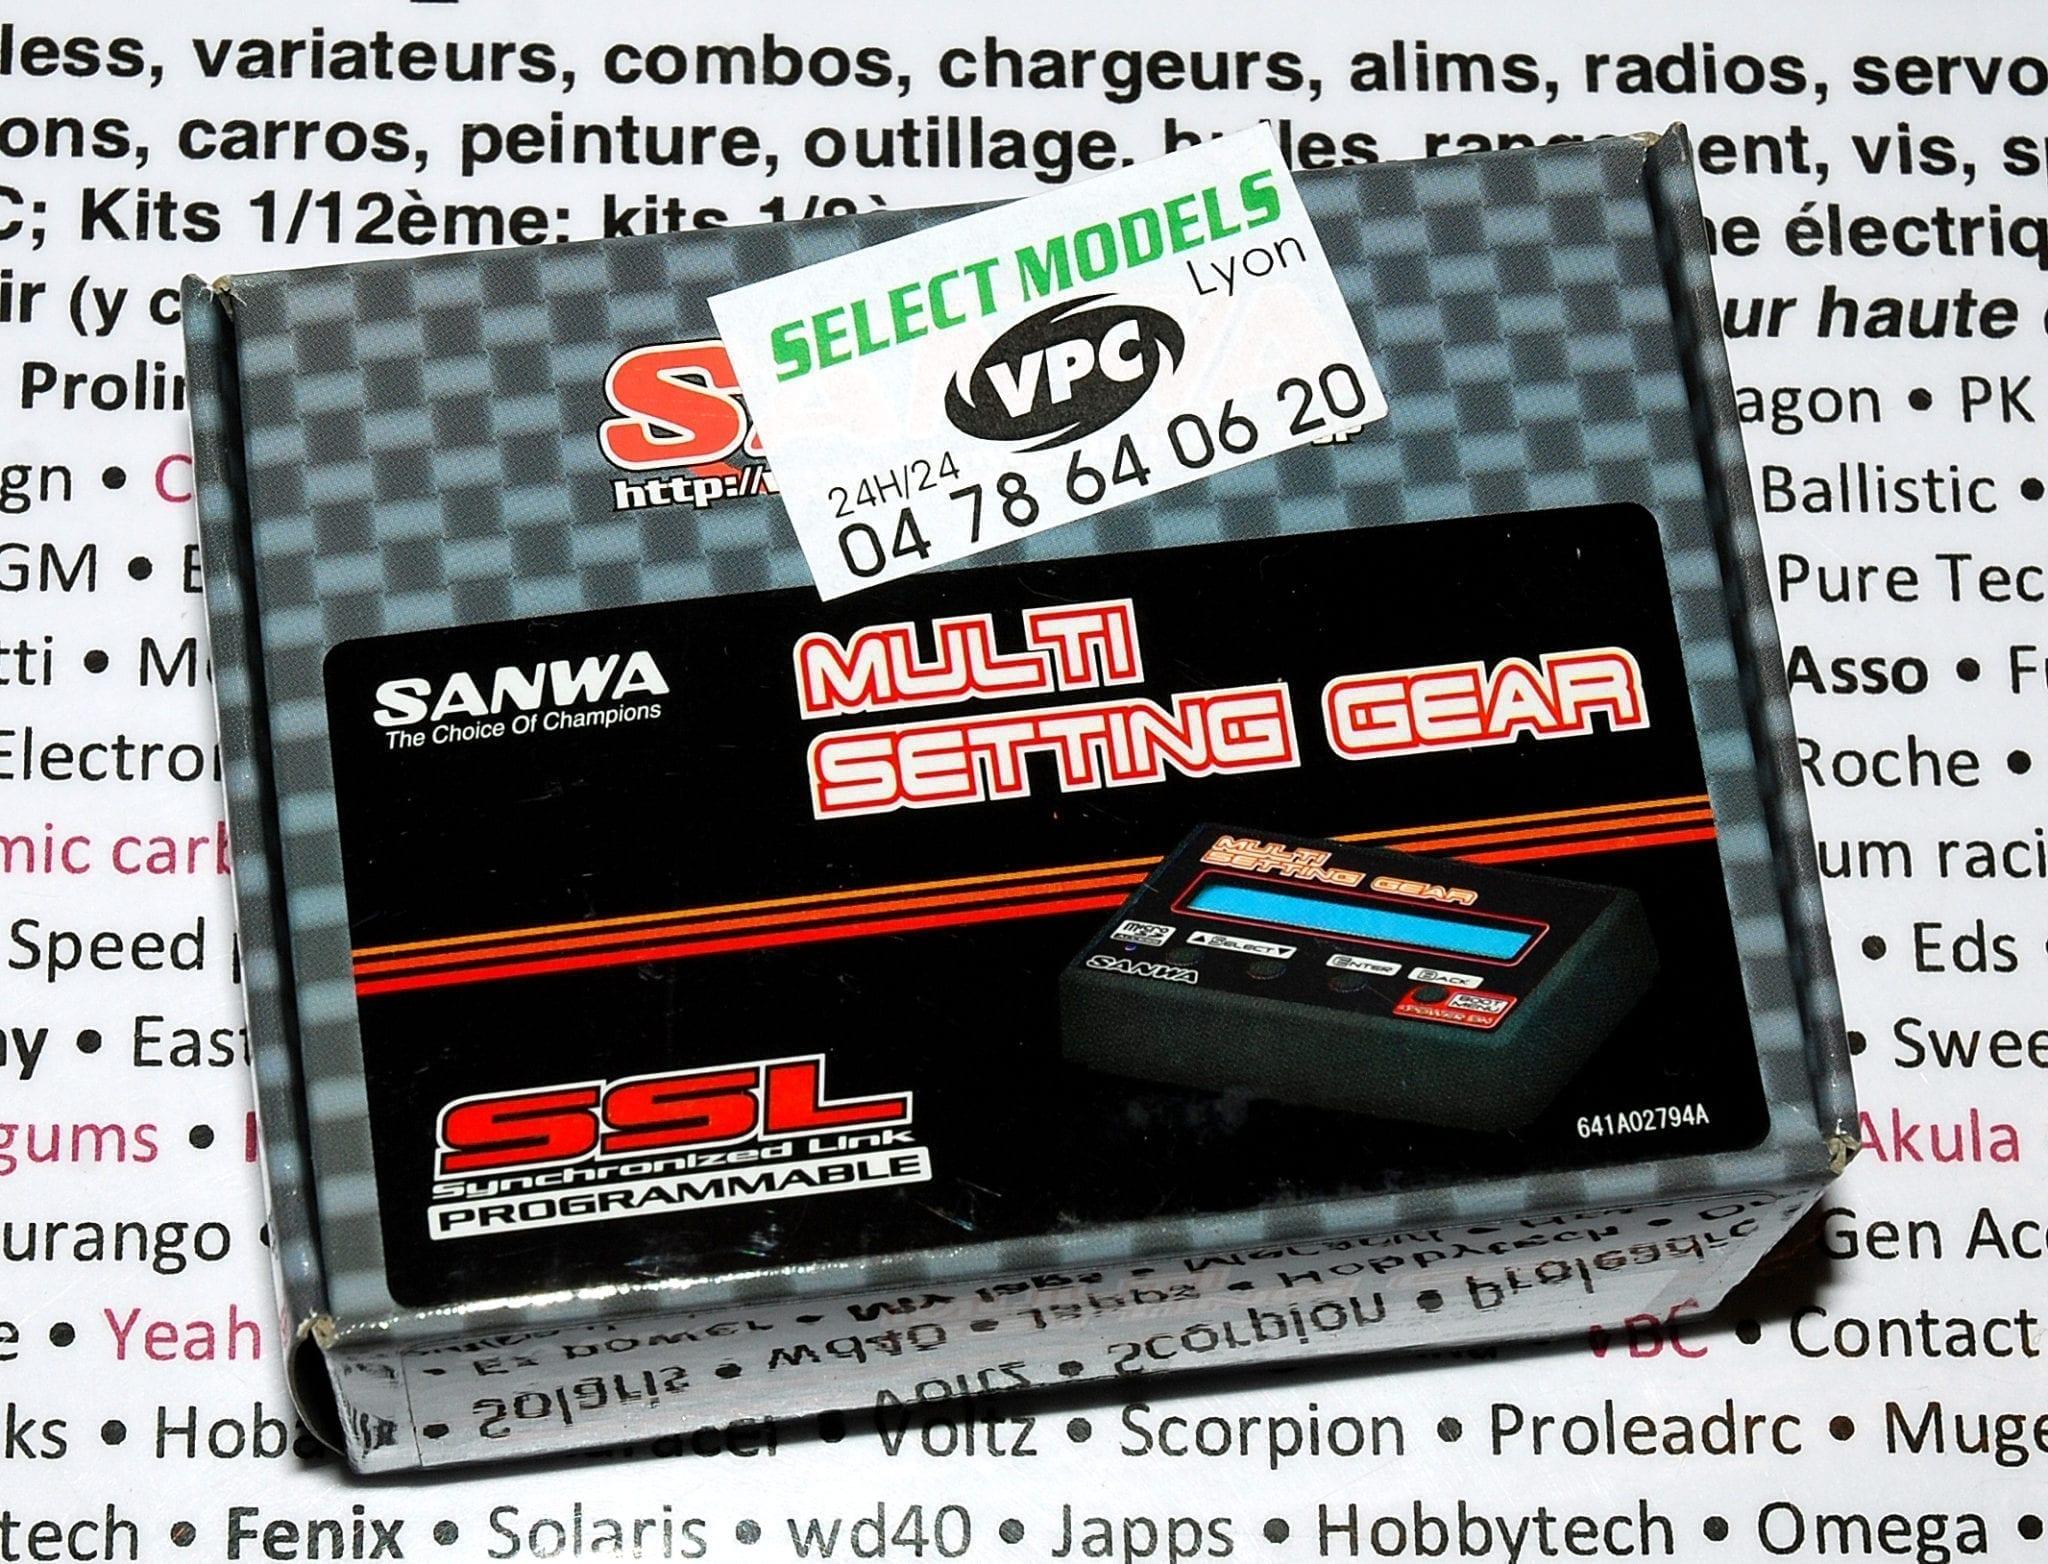 Programmateur Sanwa, multi setting gear